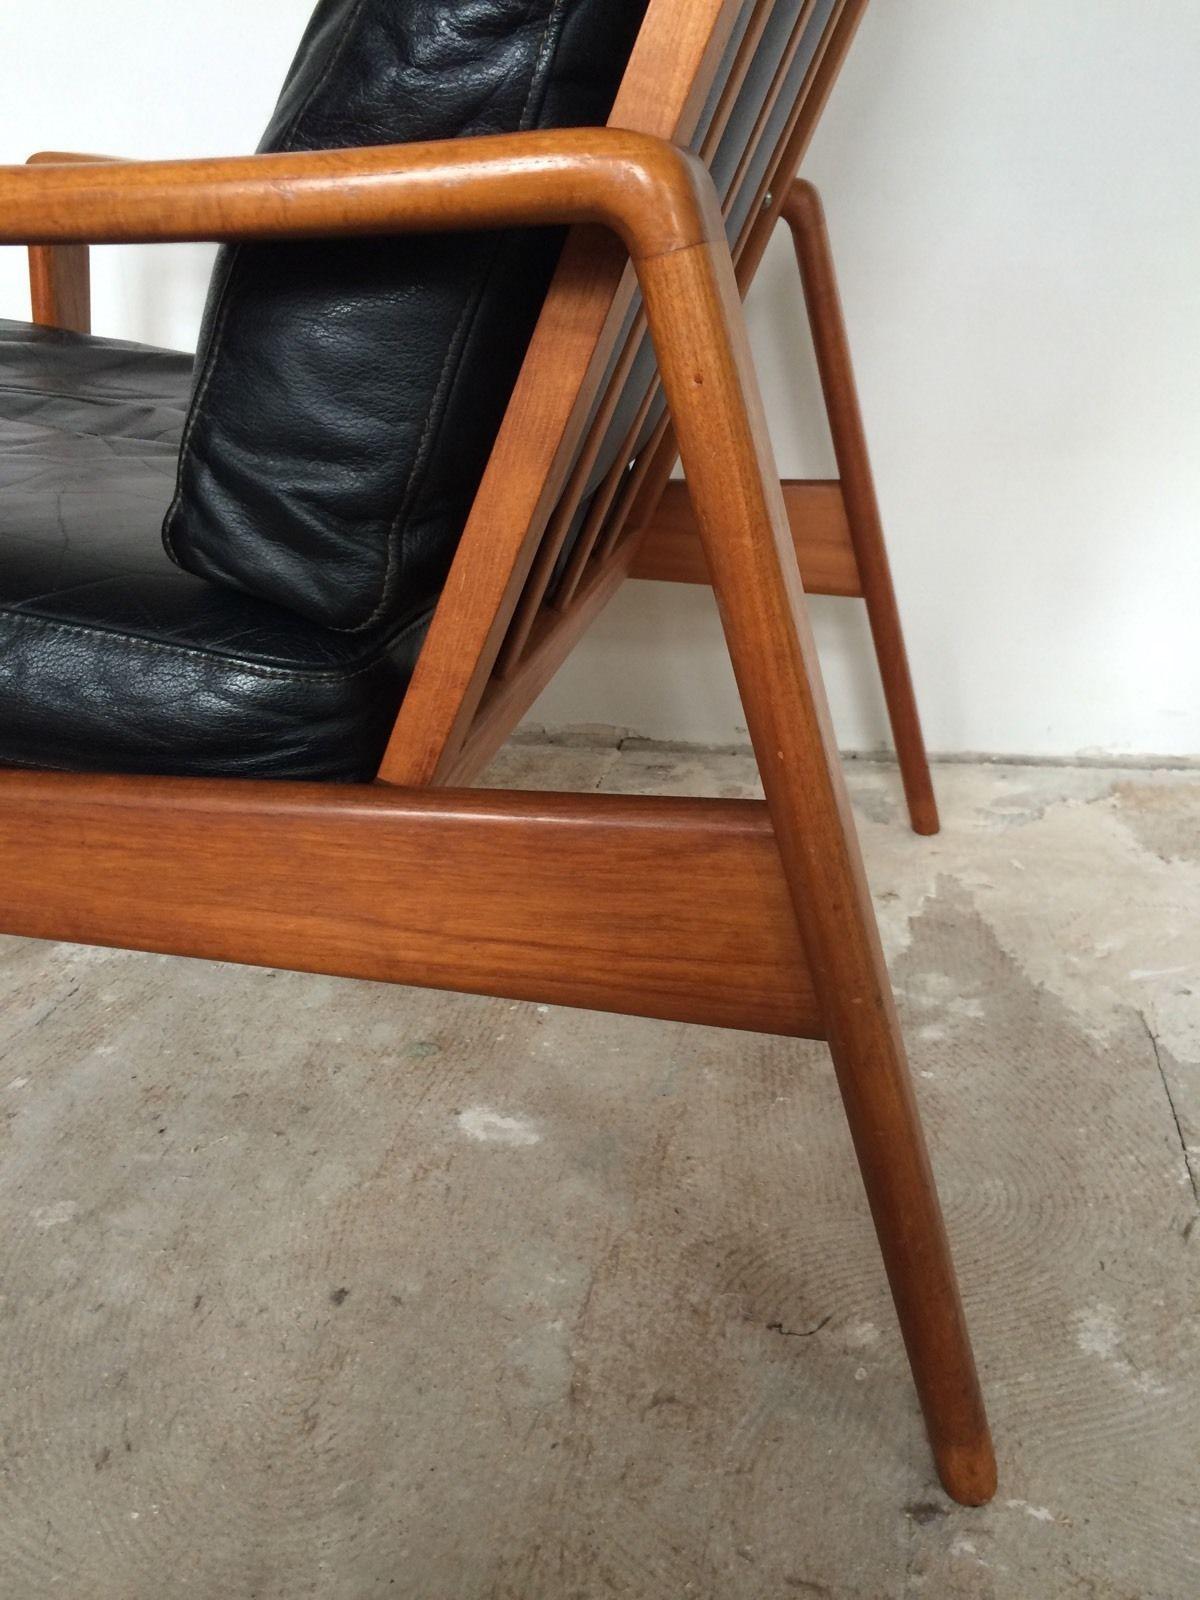 Arne Wahl Iversen Komfort Lounge Chair Teak 60s Danish Design Leder Sessel 60er 8